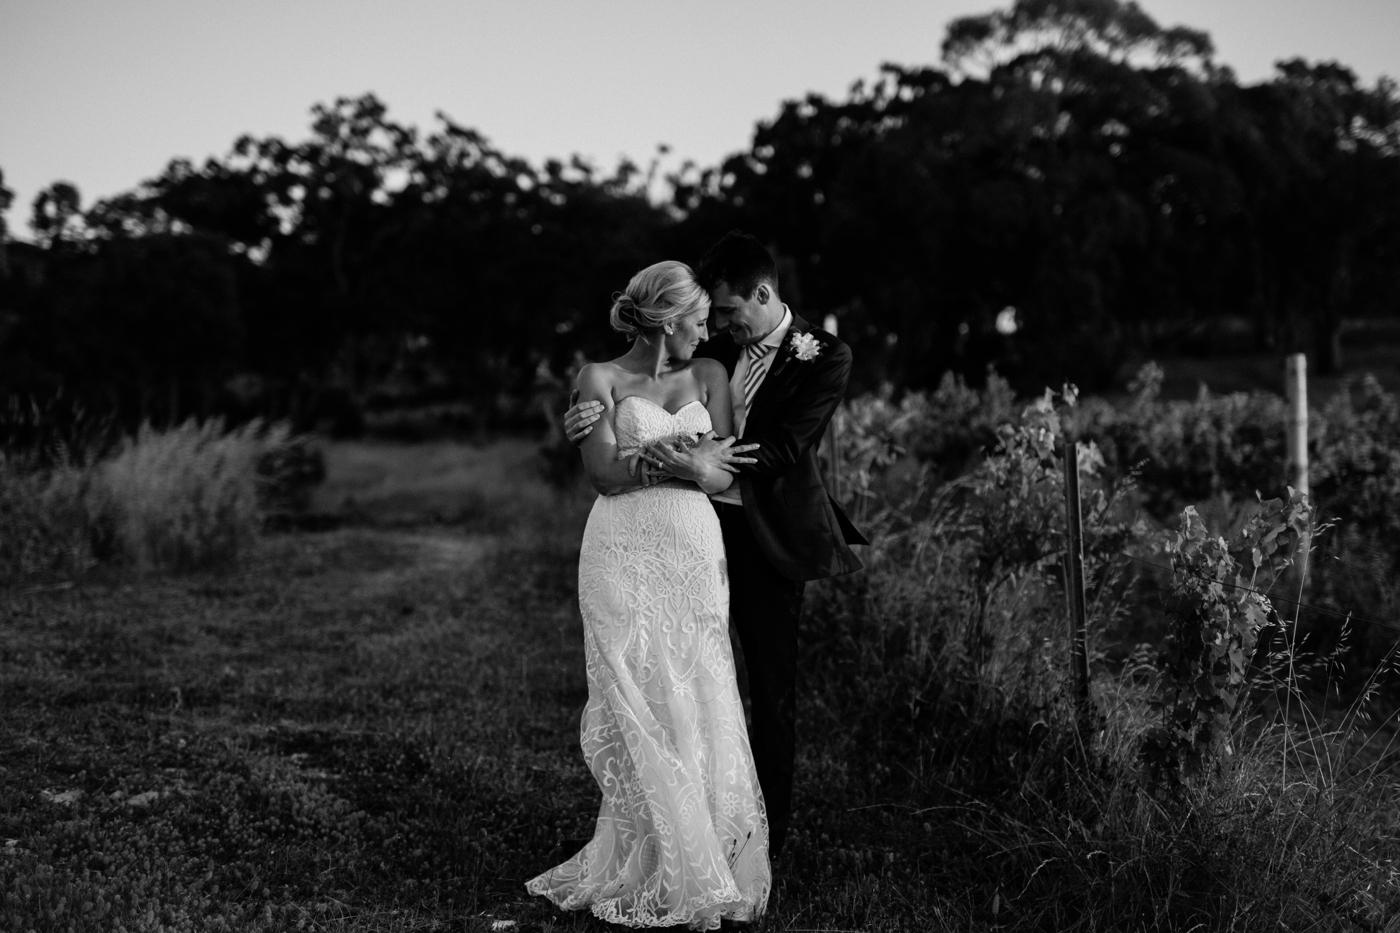 Lauren & Max - Marybank Estate Wedding - Natural wedding photographer in Adelaide - www.katherineschultzphotography.com 112